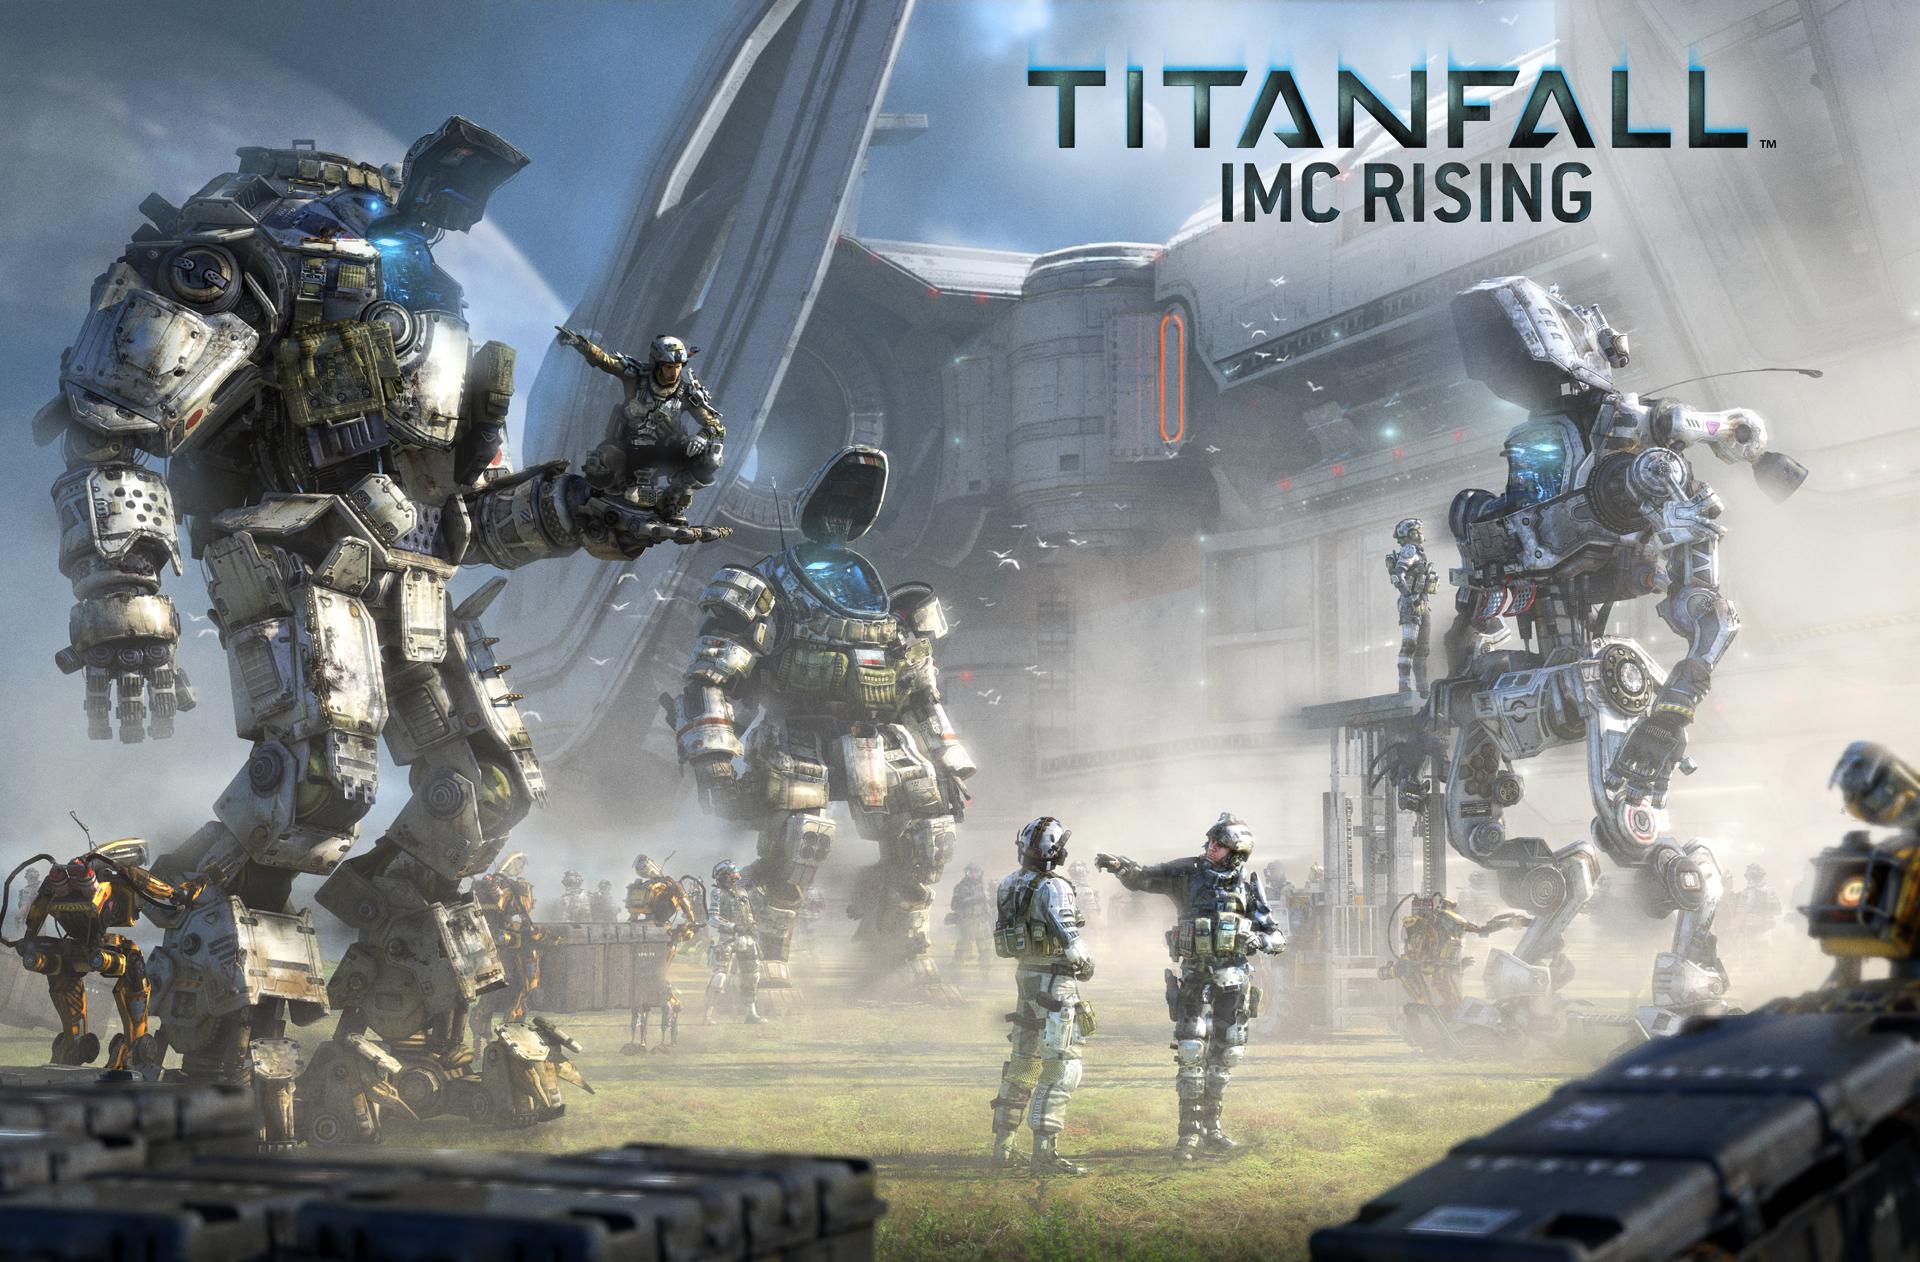 wallpaper : video games, titanfall, screenshot, mecha, pc game